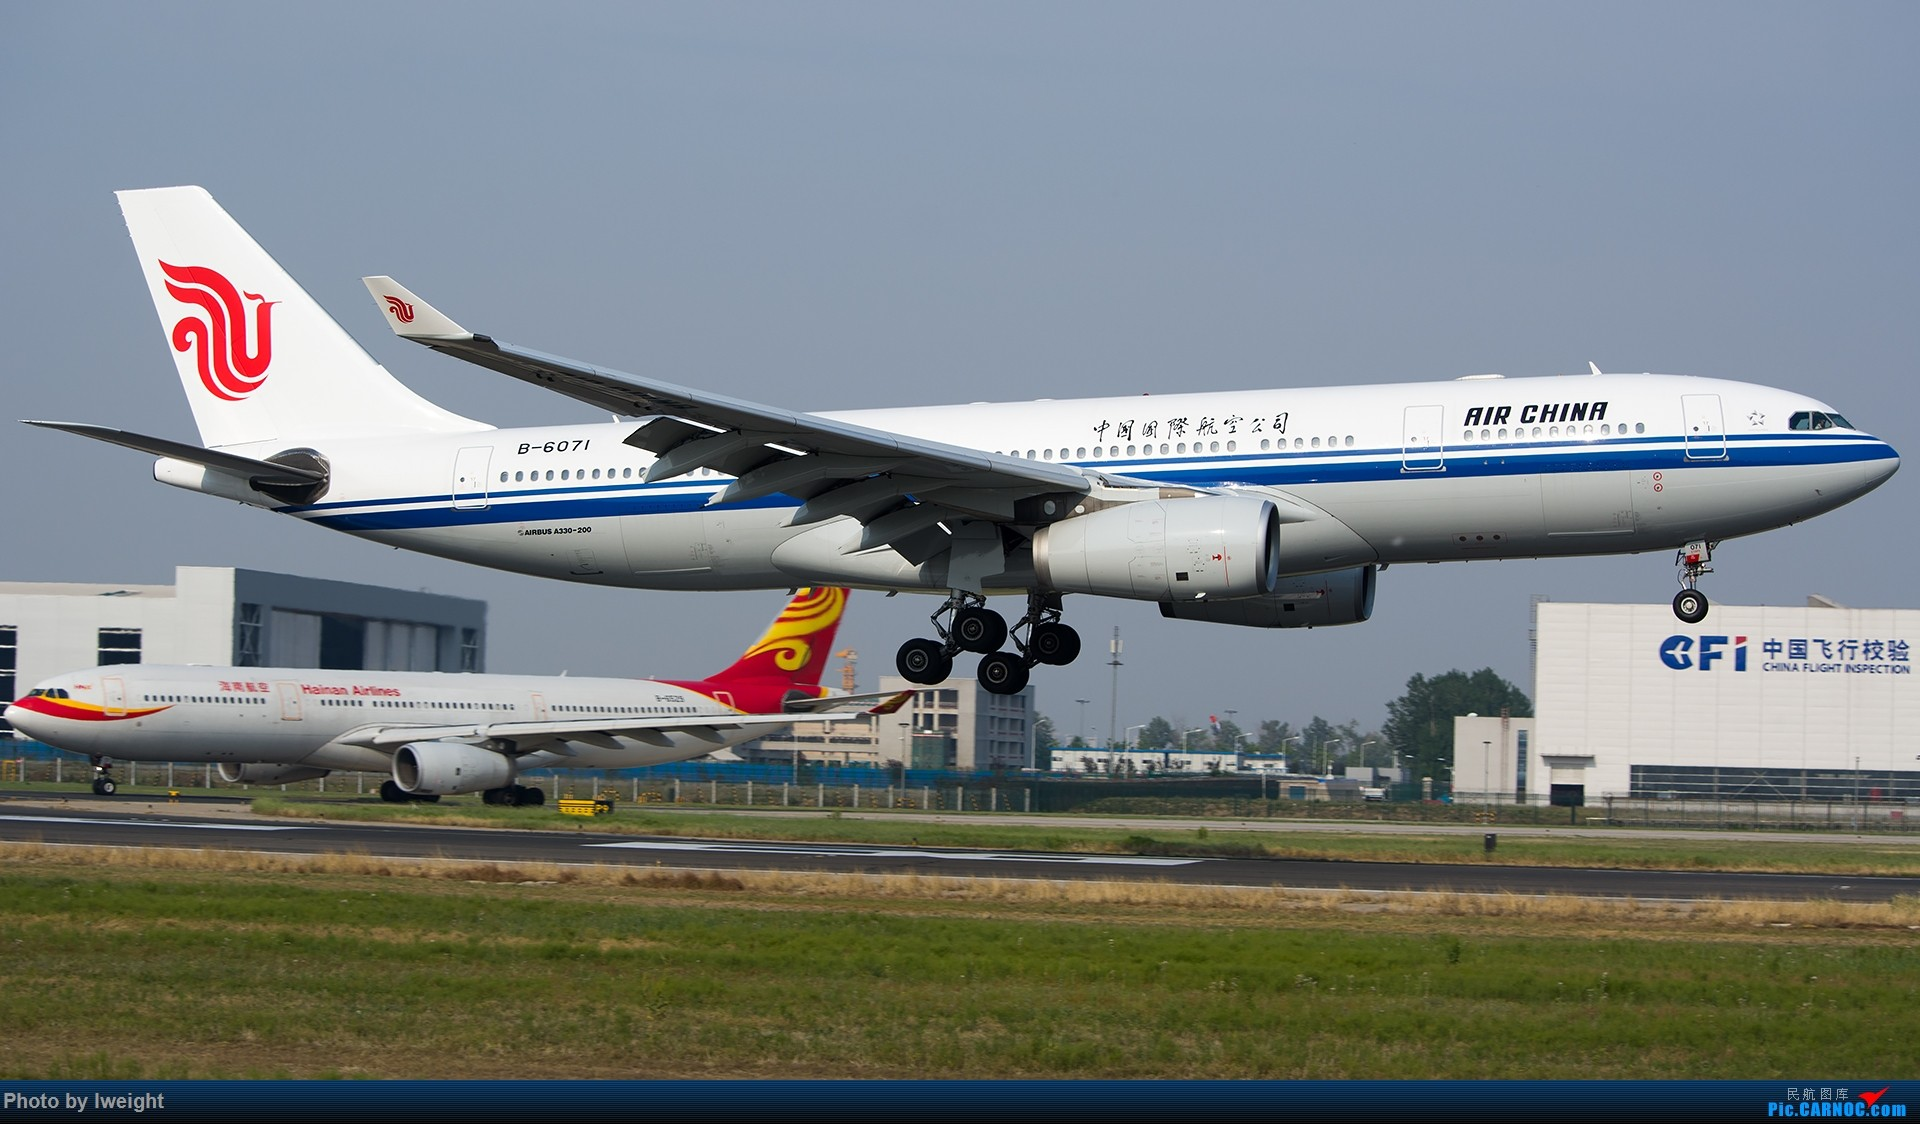 Re:[原创]周末帝都霾天拍机,凑合看看吧【2015-5-23】 AIRBUS A330-200 B-6071 中国北京首都国际机场